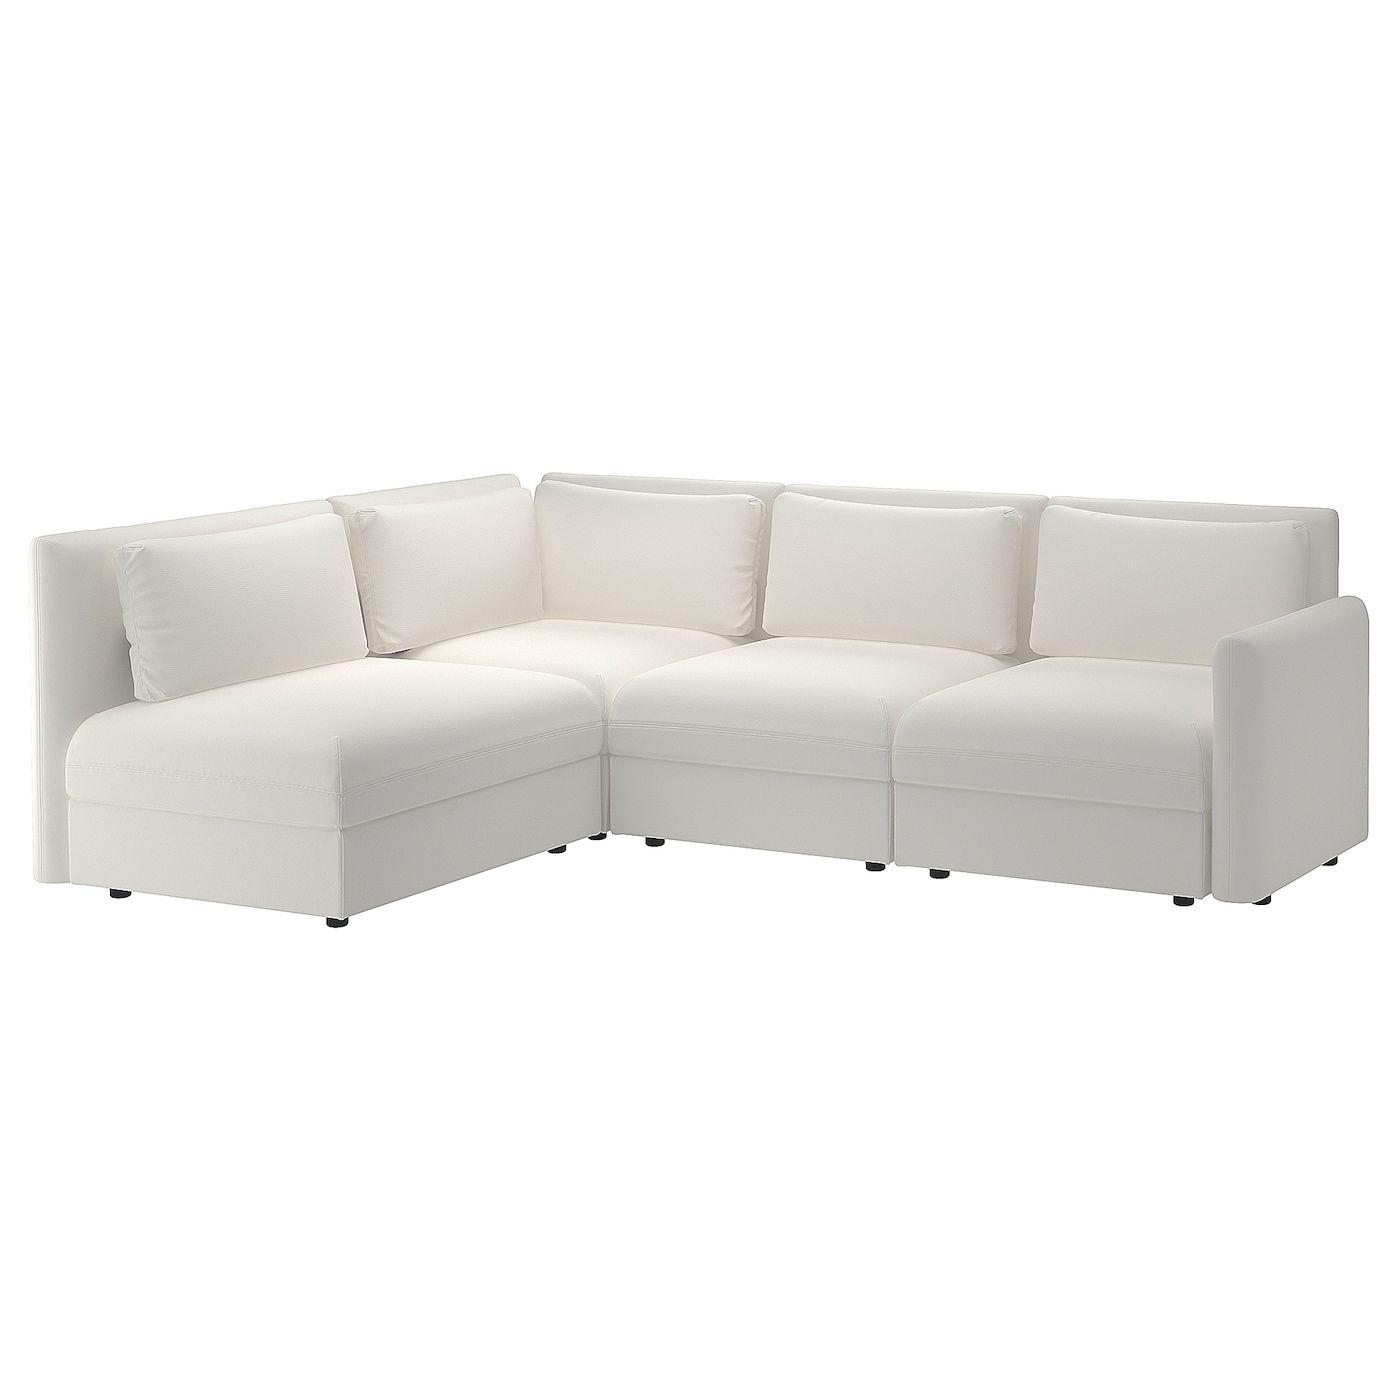 Vallentuna Modular Corner Sofa 3 Seat With Storage Murum White Get It Today Ikea In 2020 Modular Corner Sofa Vallentuna Corner Sofa